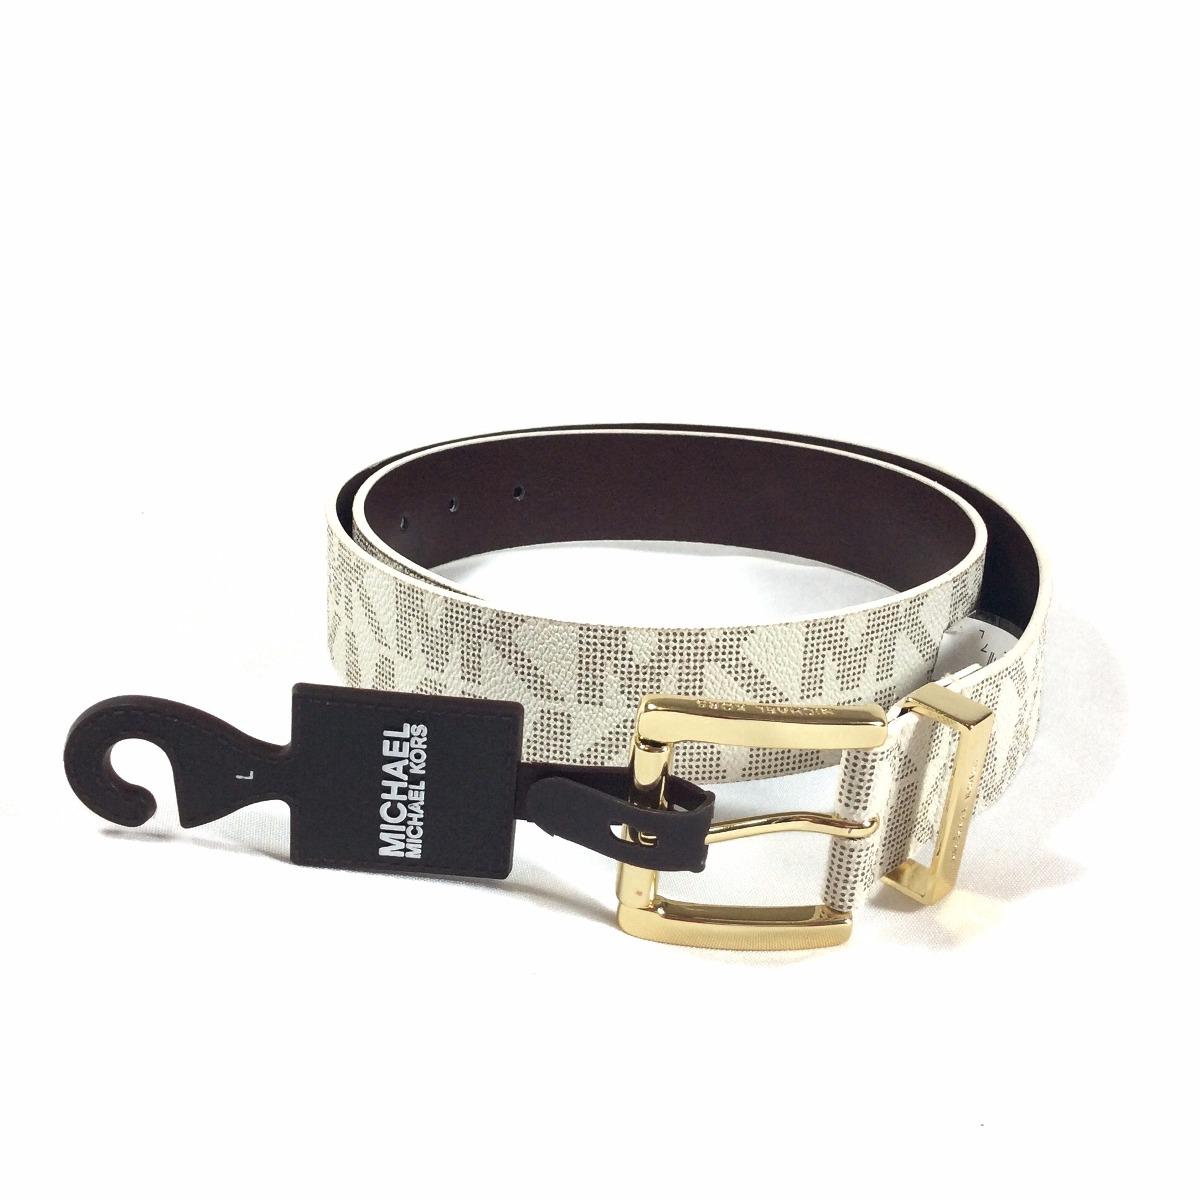 Cinturones Michael Kors Originales